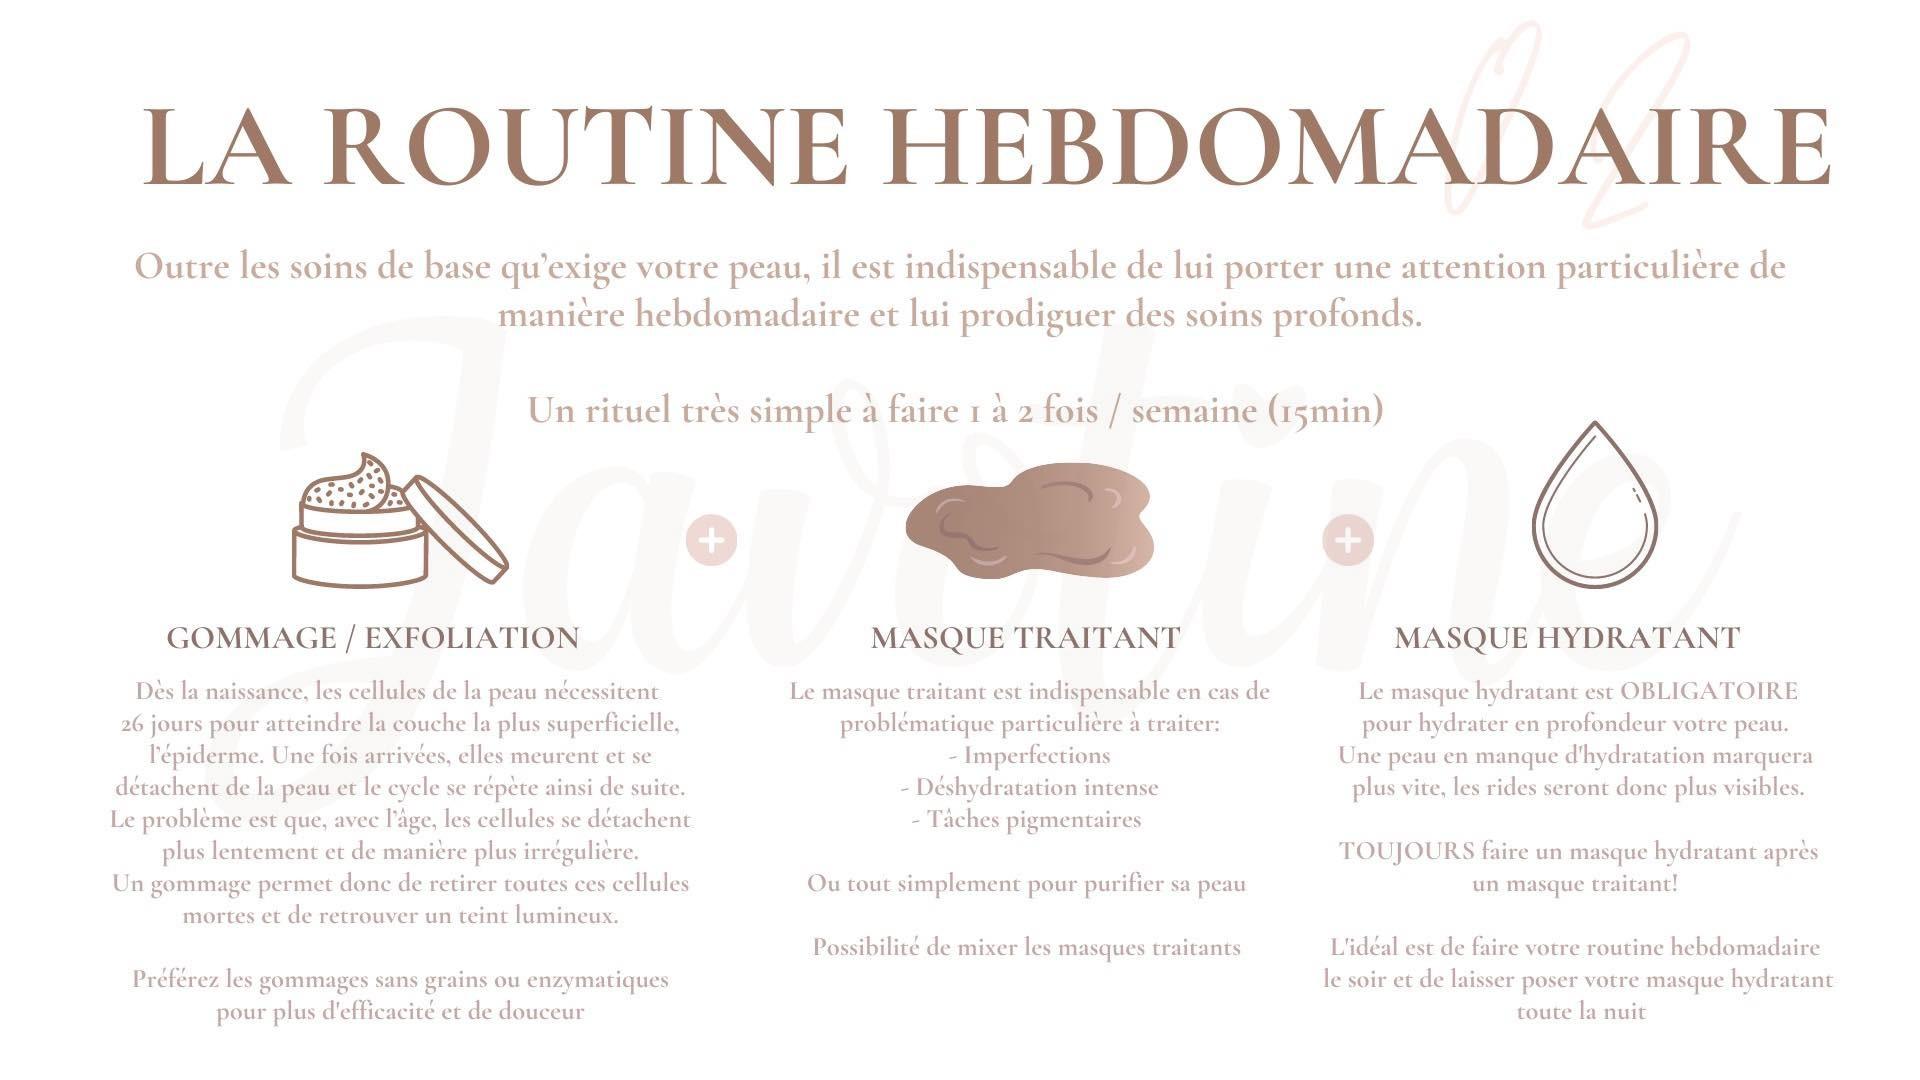 Routine_beaute_hebdomadaire_Javotine.jpg